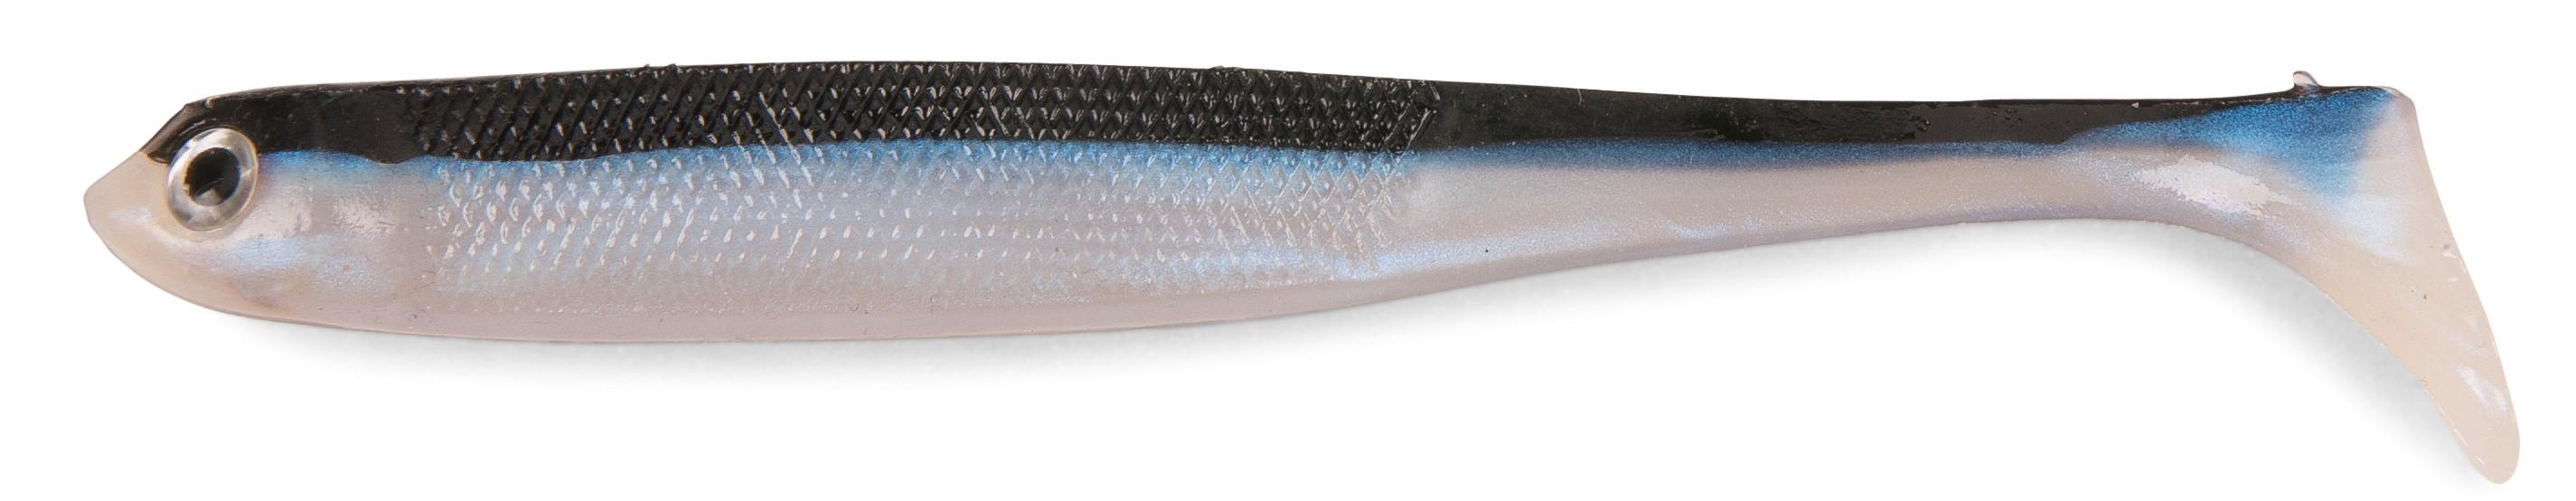 Iron Claw gumová nástraha Slim Jim 16 cm Vzor HR, 3 ks